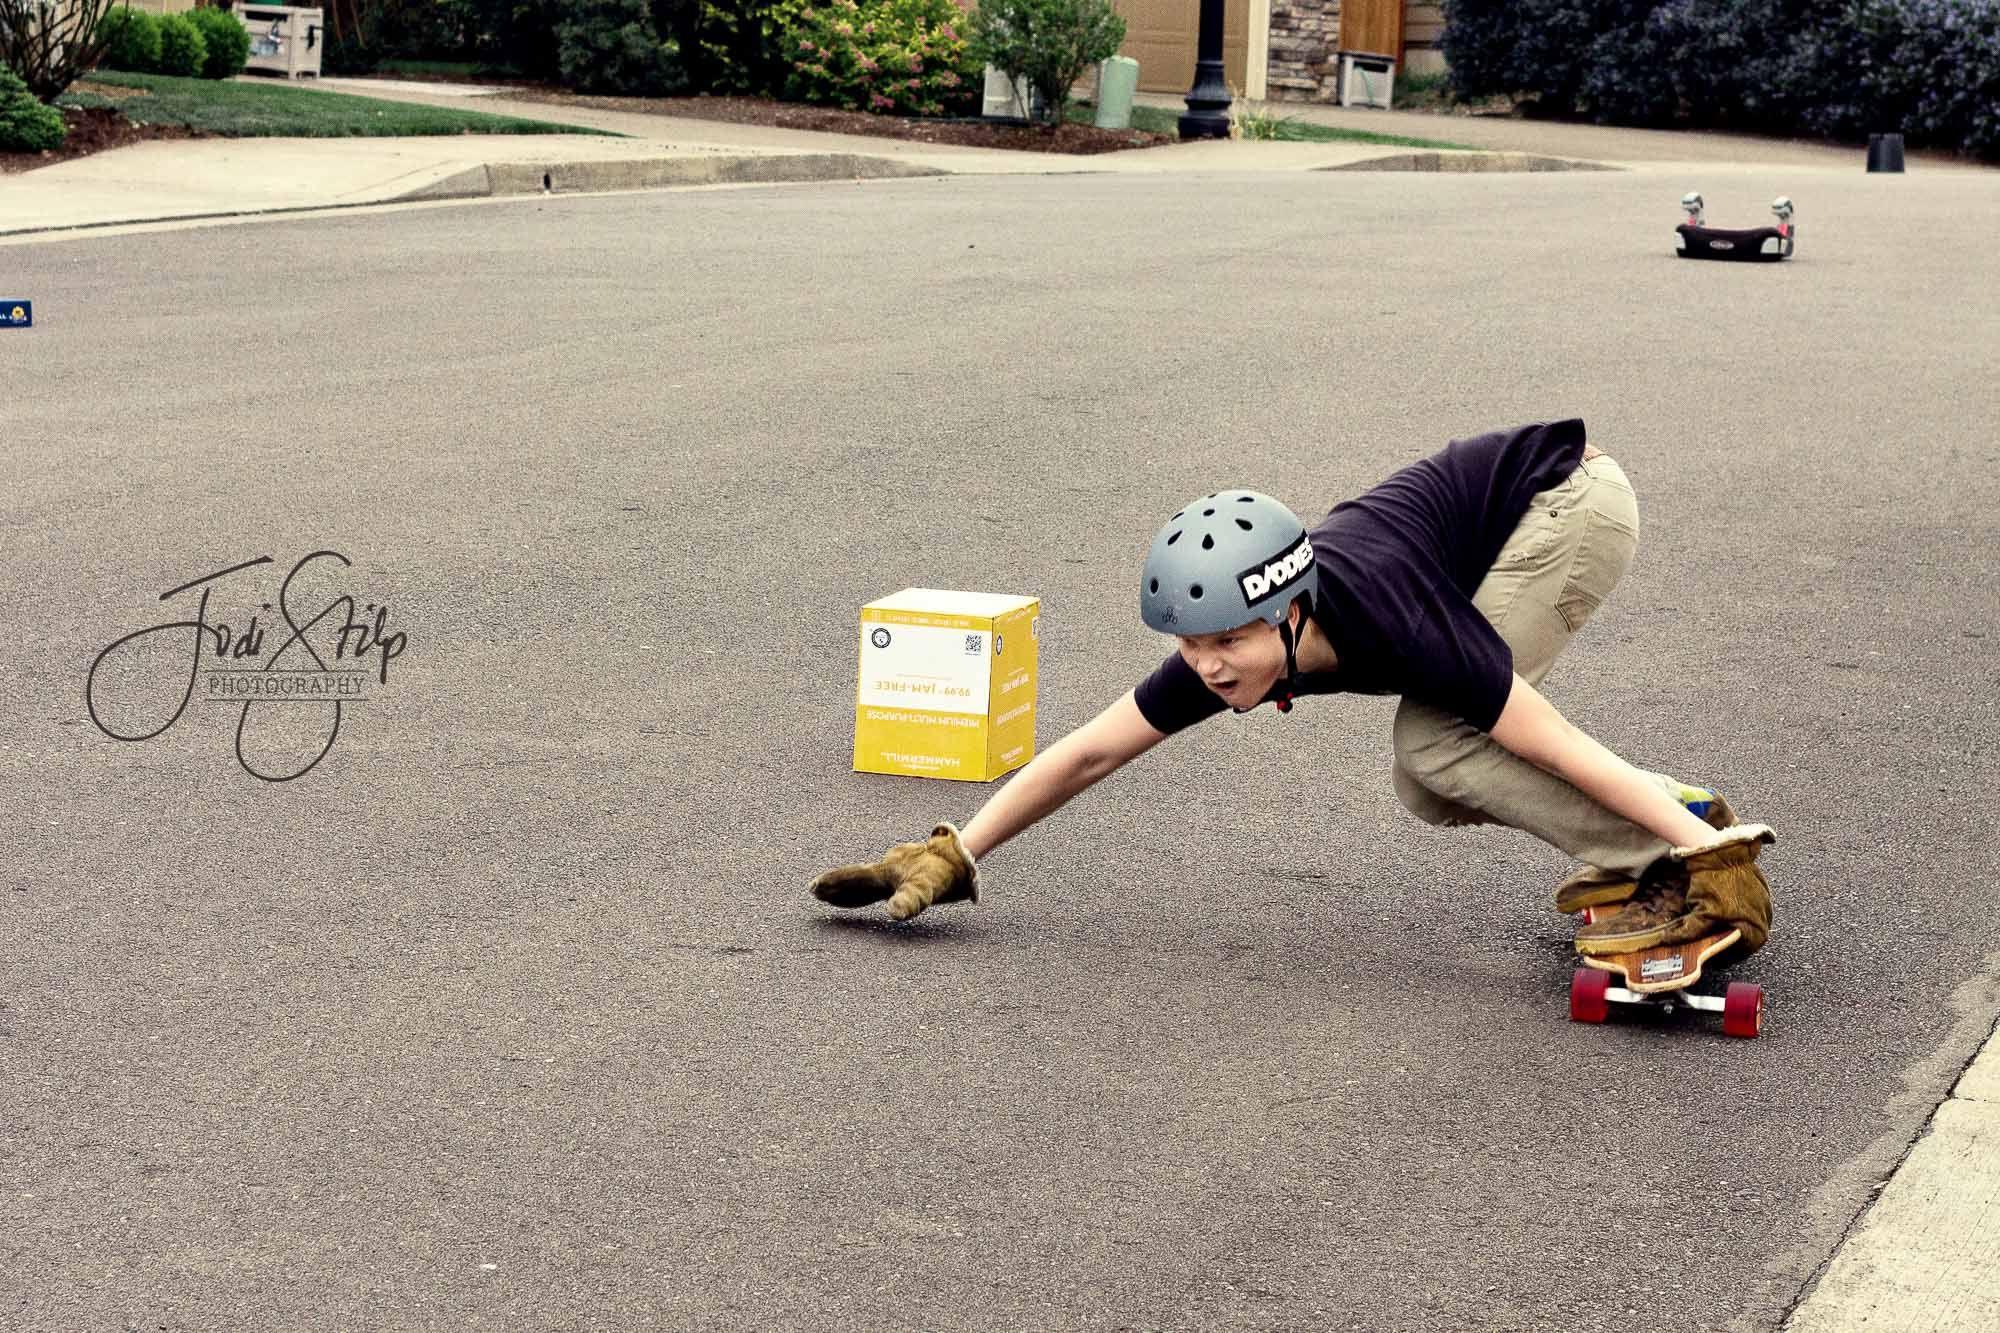 www.jodistilpphotography.com, sports, skateboard, long board, home made slide gloves, home made skate course, do it yourself